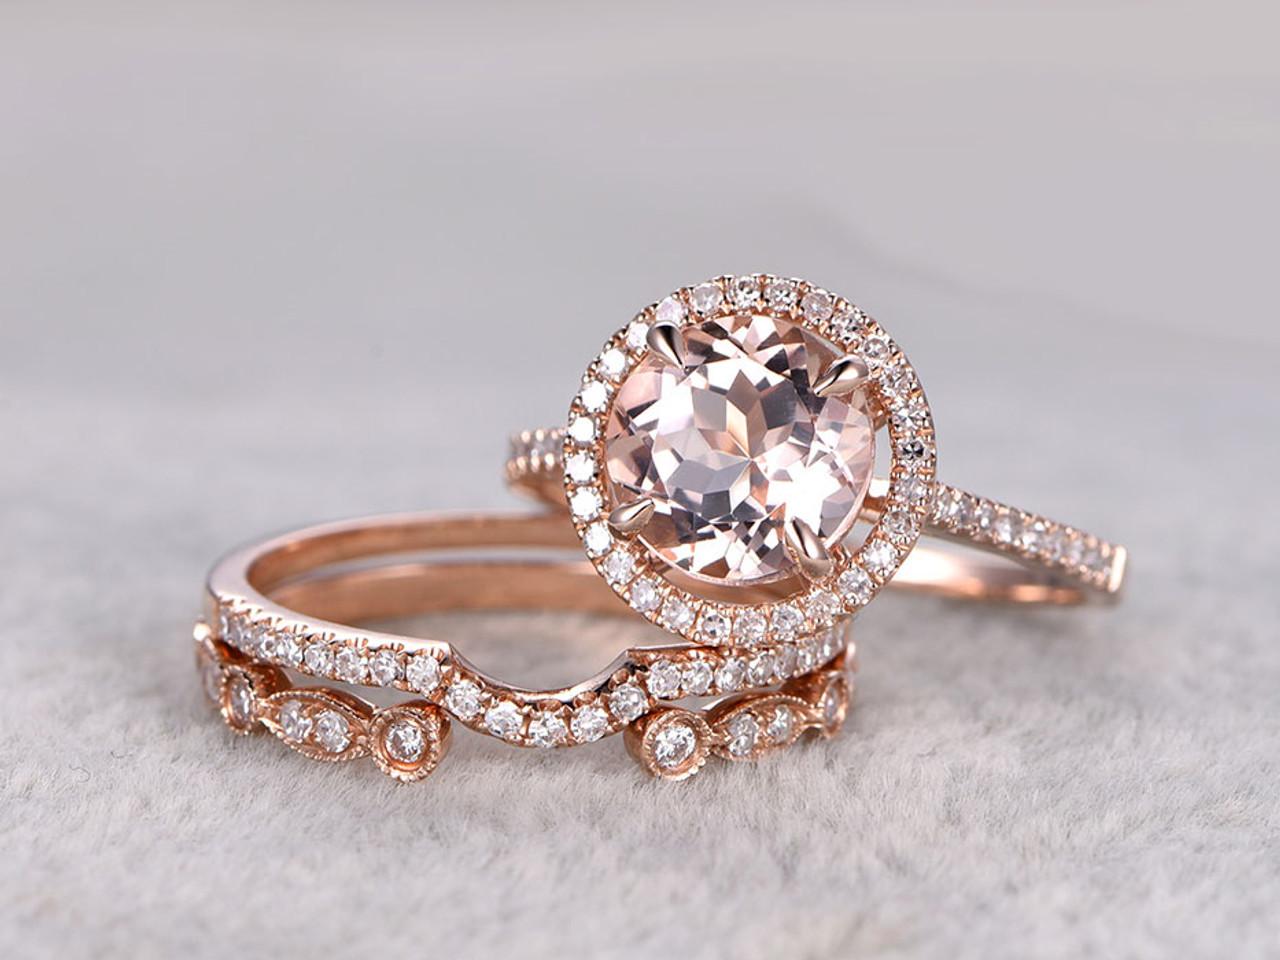 3pcs Morganite Rose Gold Wedding Set Diamond Eternity Ring